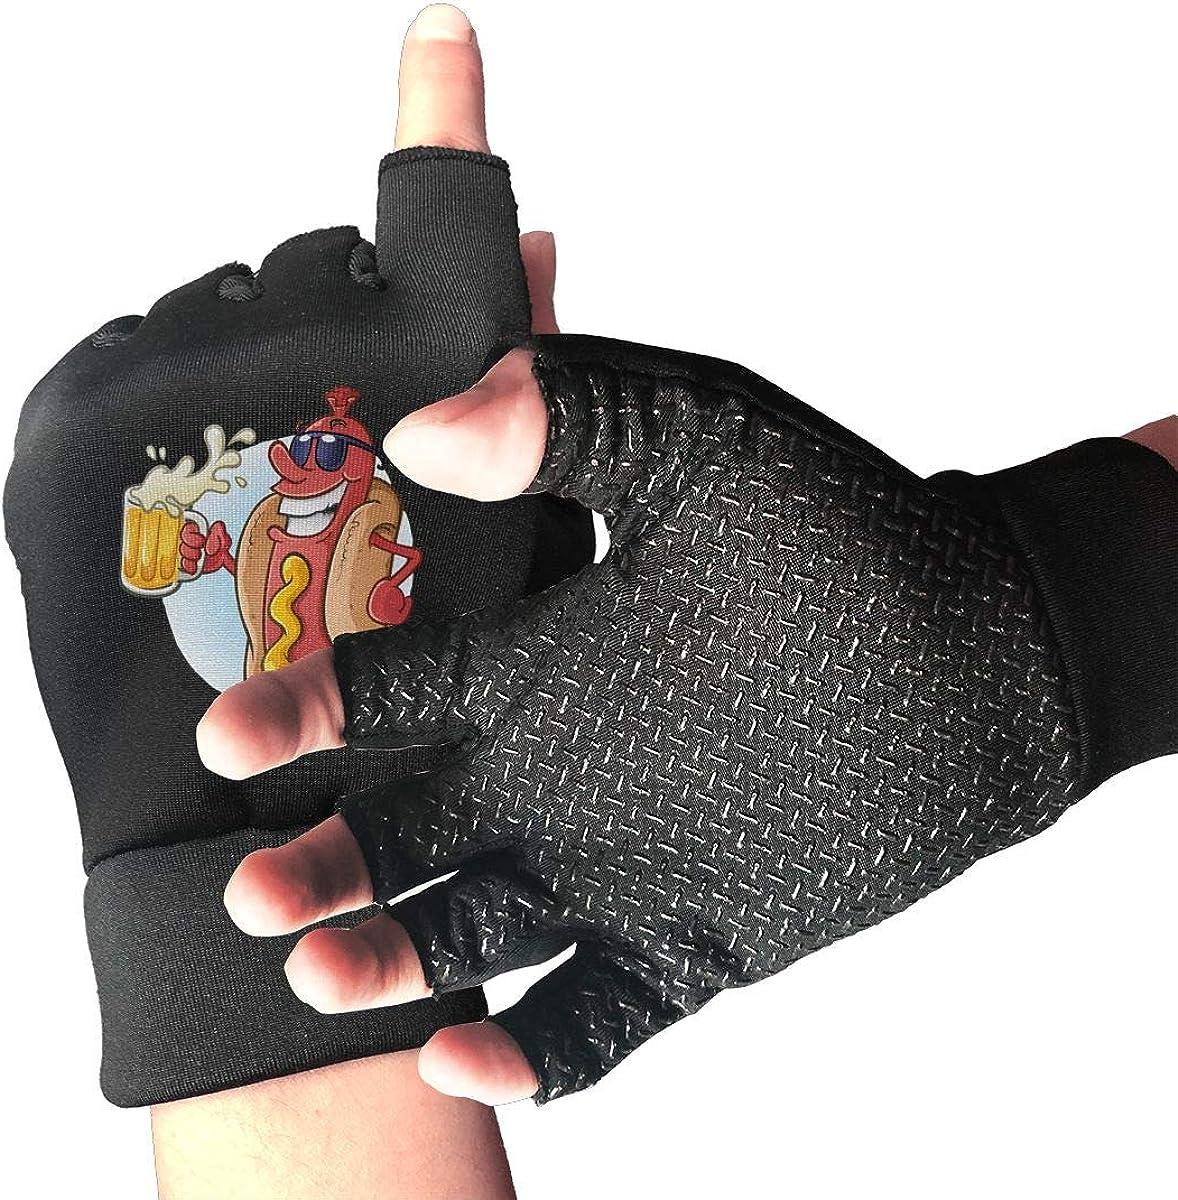 Gloves Cool Beer Hot Dog Fingerless Gloves Short Touchscreen Gloves Winter Motorcycle Biker Mitten